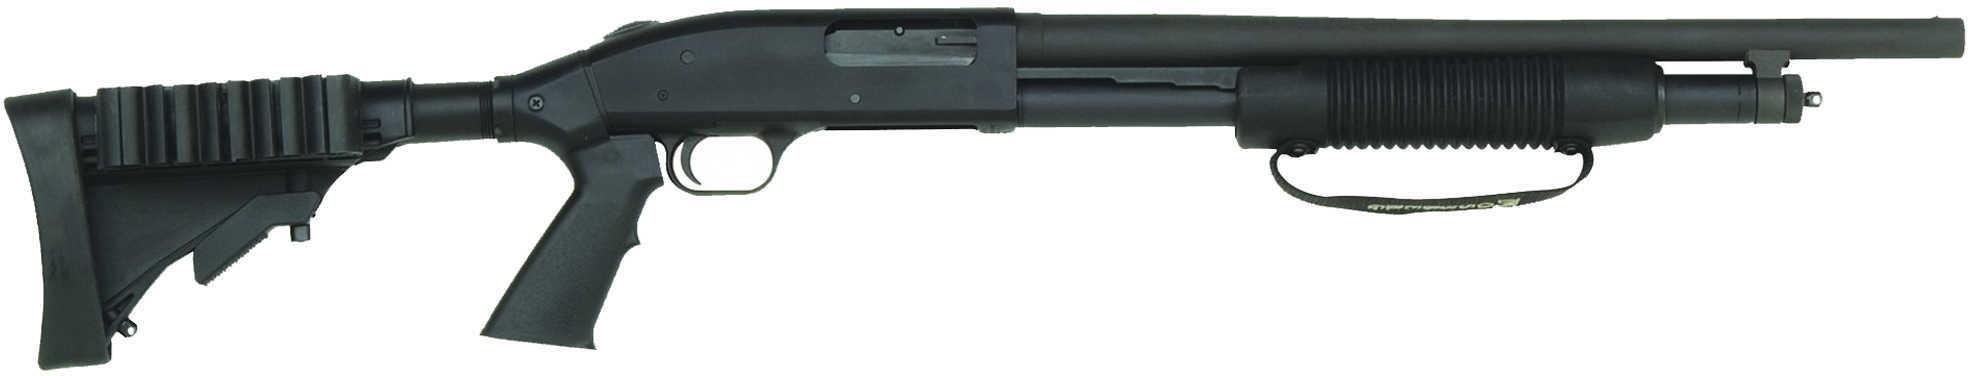 "Mossberg 500 Tactical 12 Gauge 18.5"" Adjustable Stock 6 Round Shotgun 50420"